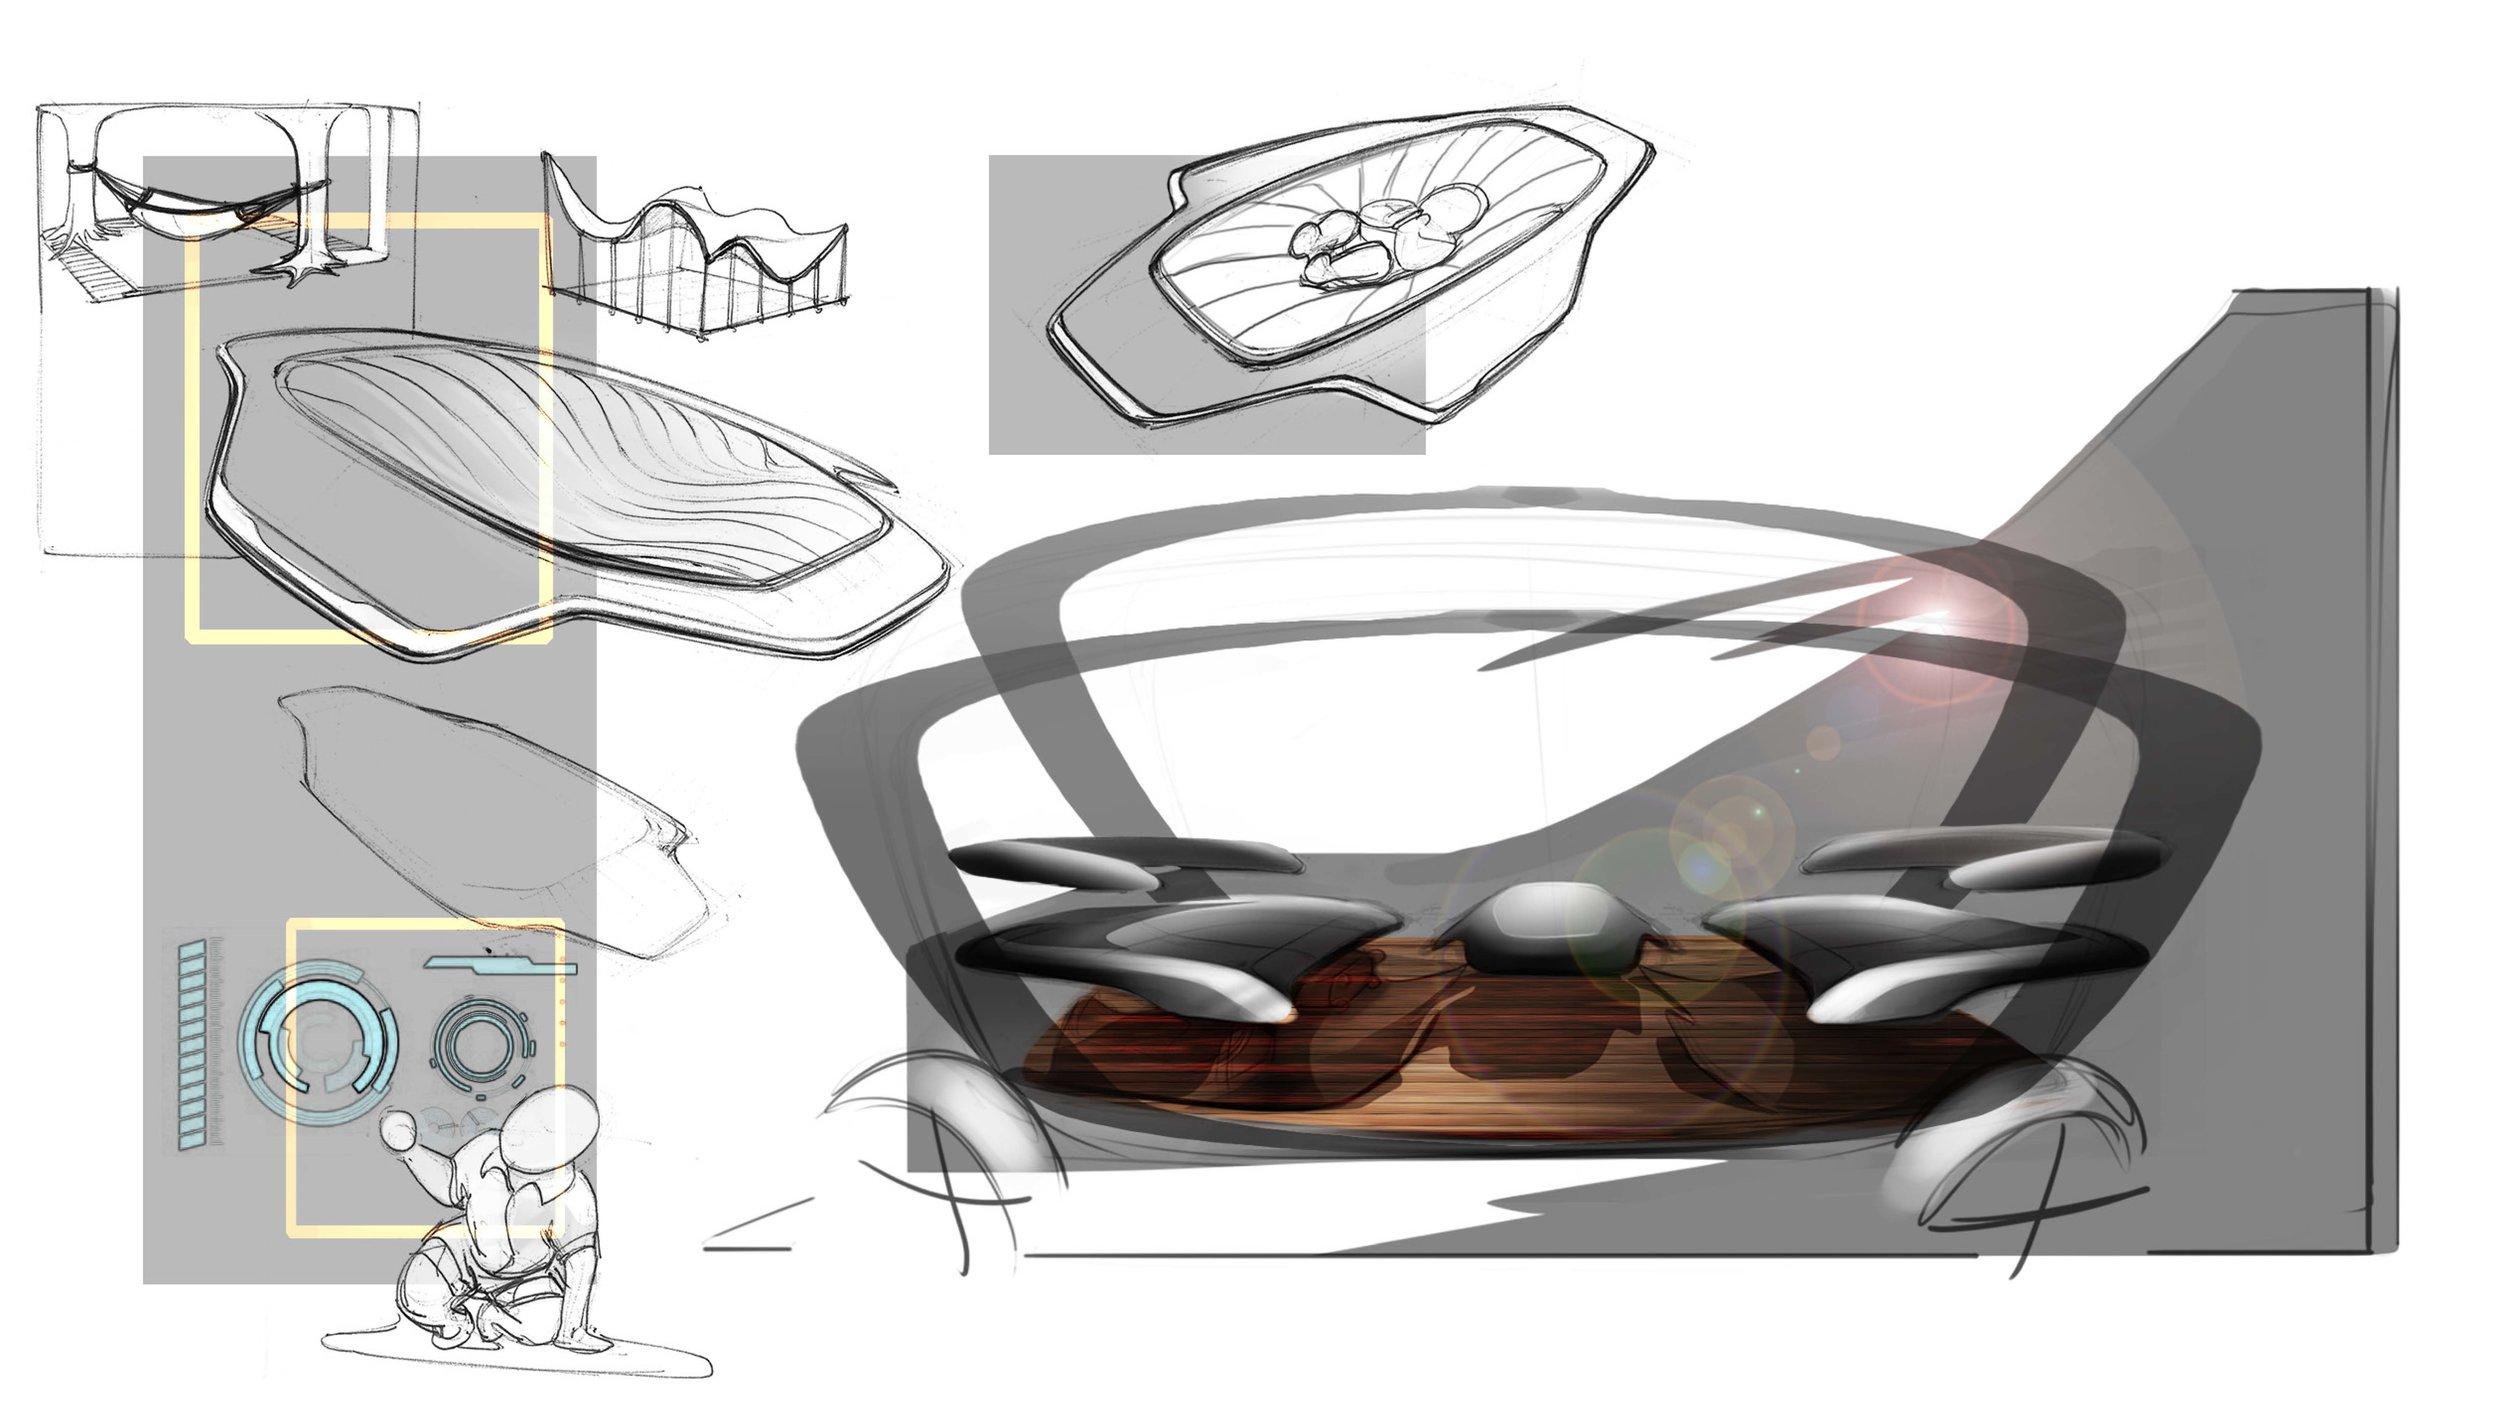 171009_Autono_Me_and_You_Design_Presentation_Page_12.jpg